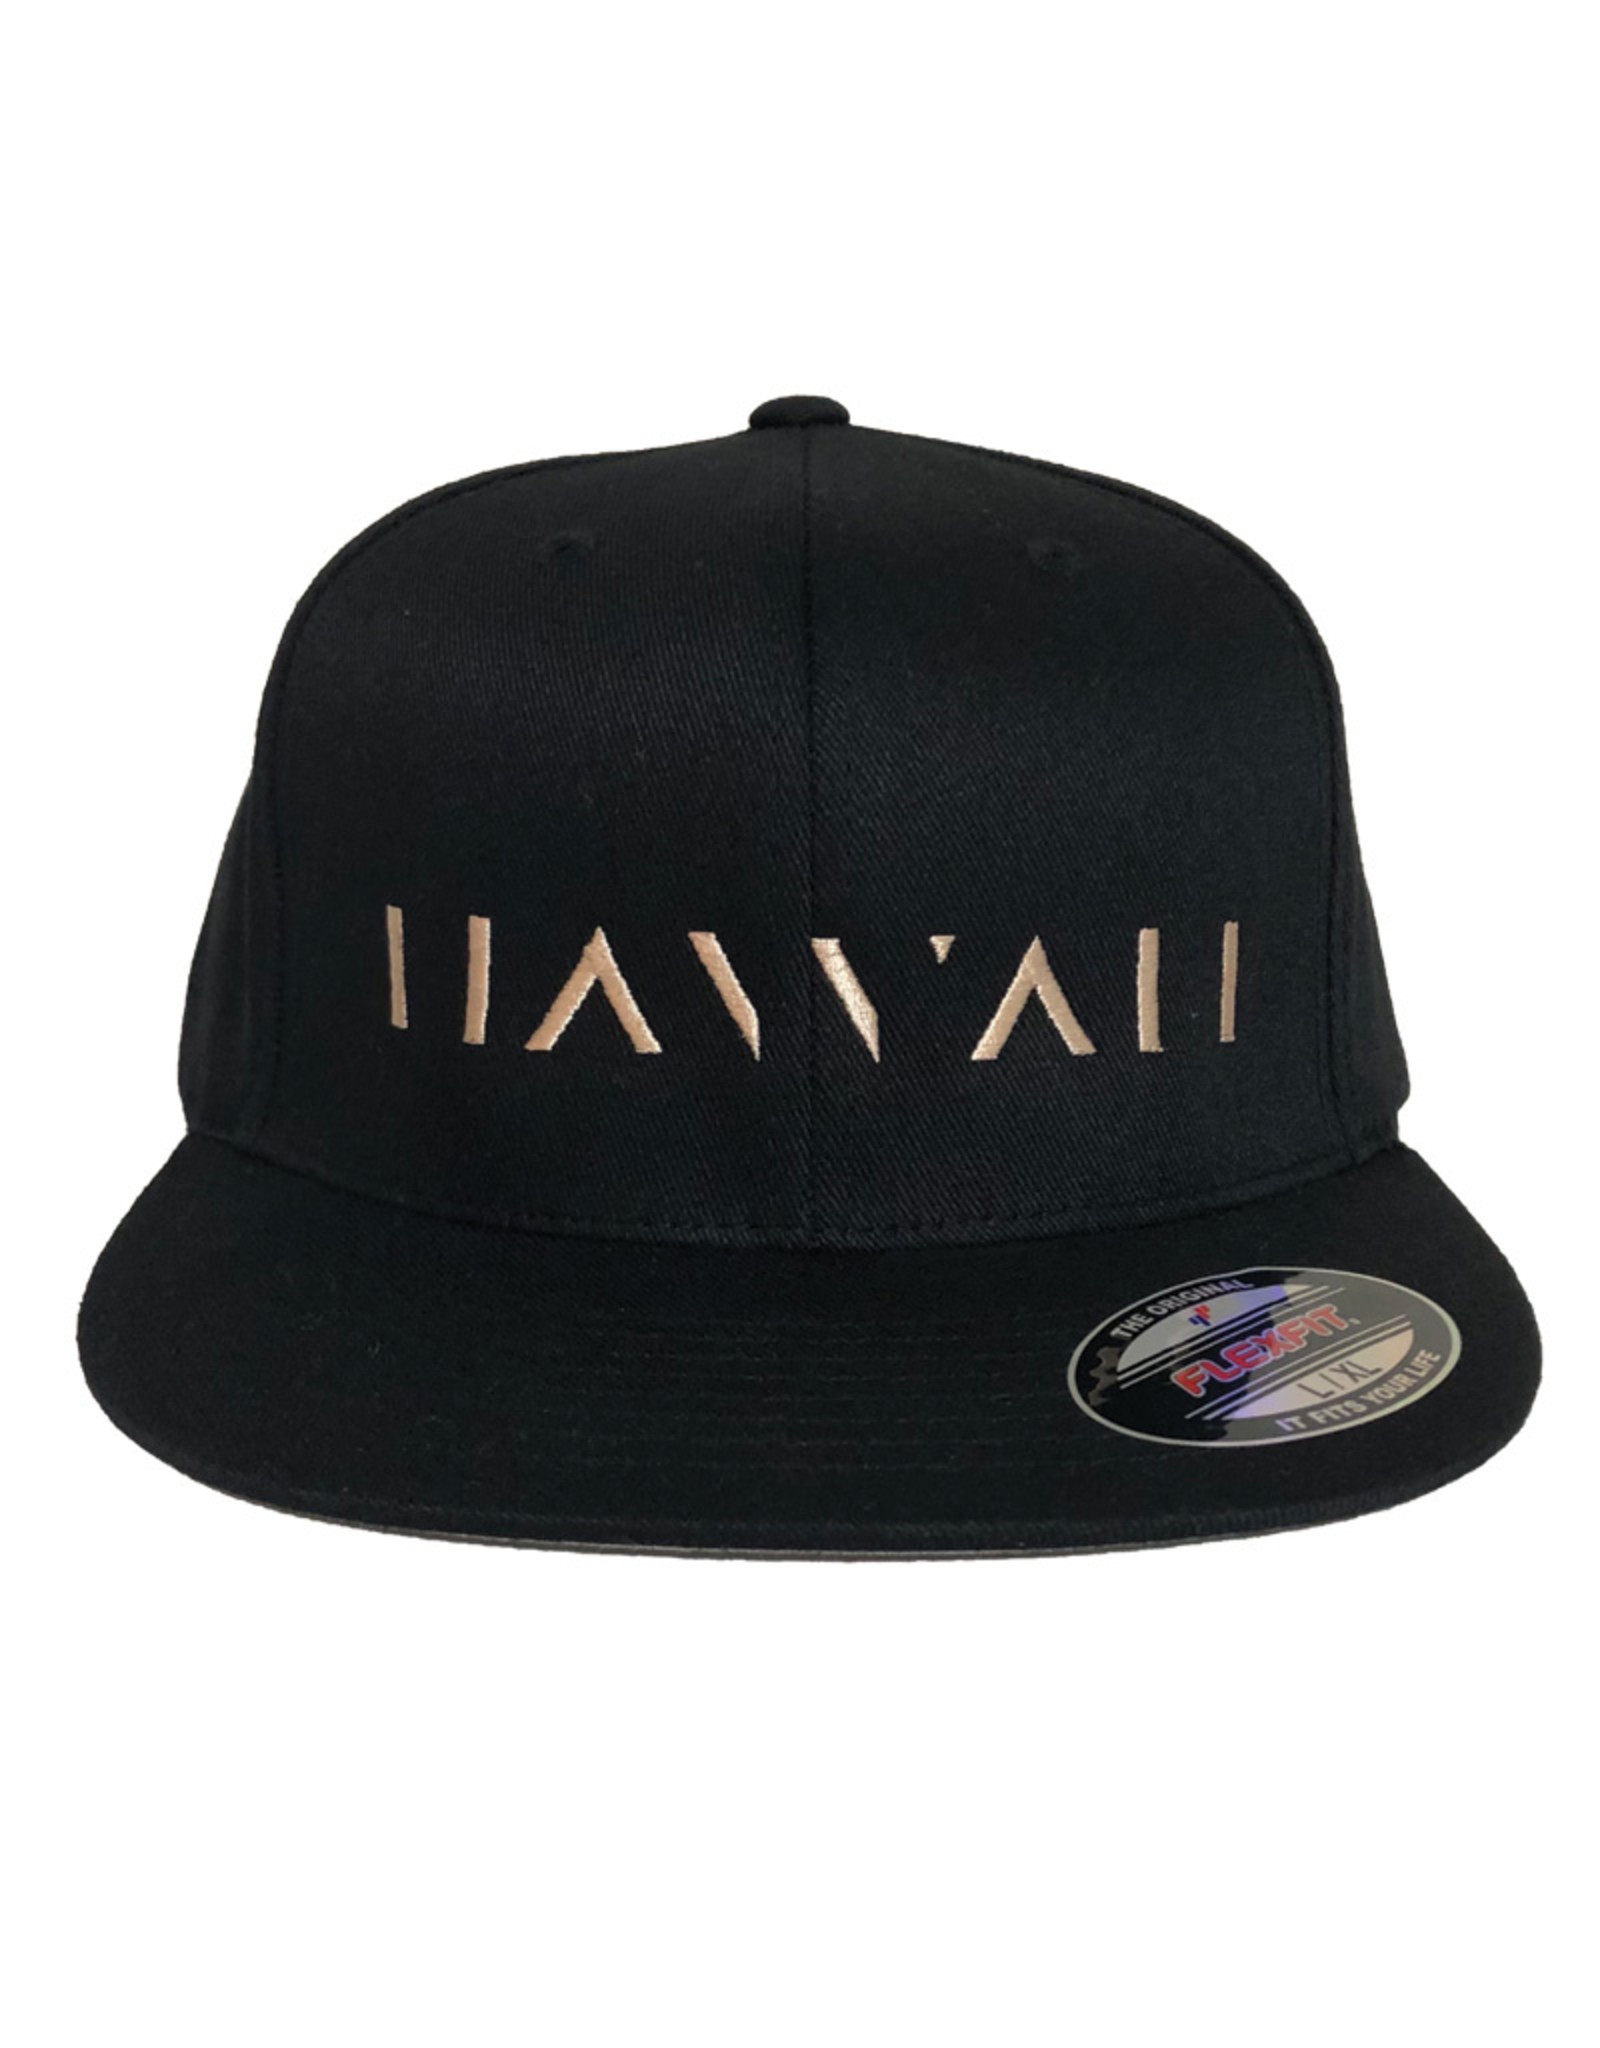 11AWA11 Night Bird cap